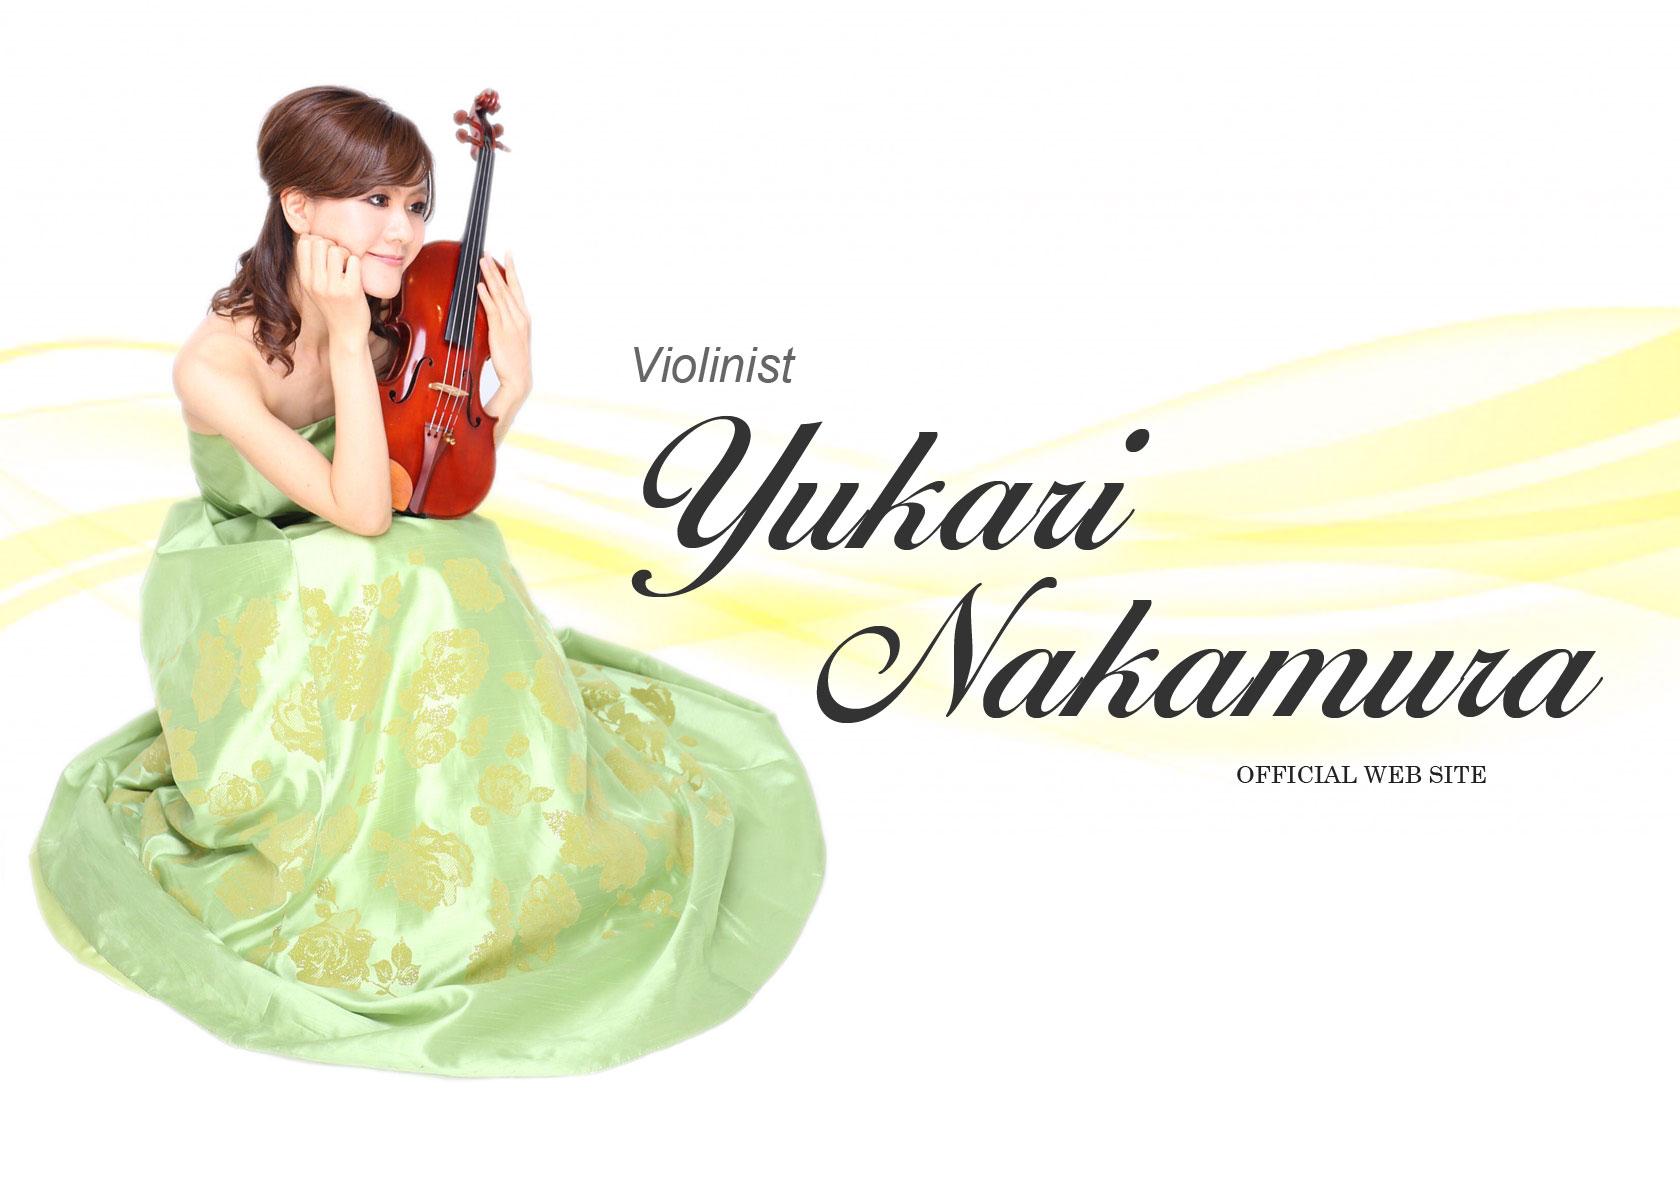 Violinist Yukari Nakamura Official Web Site